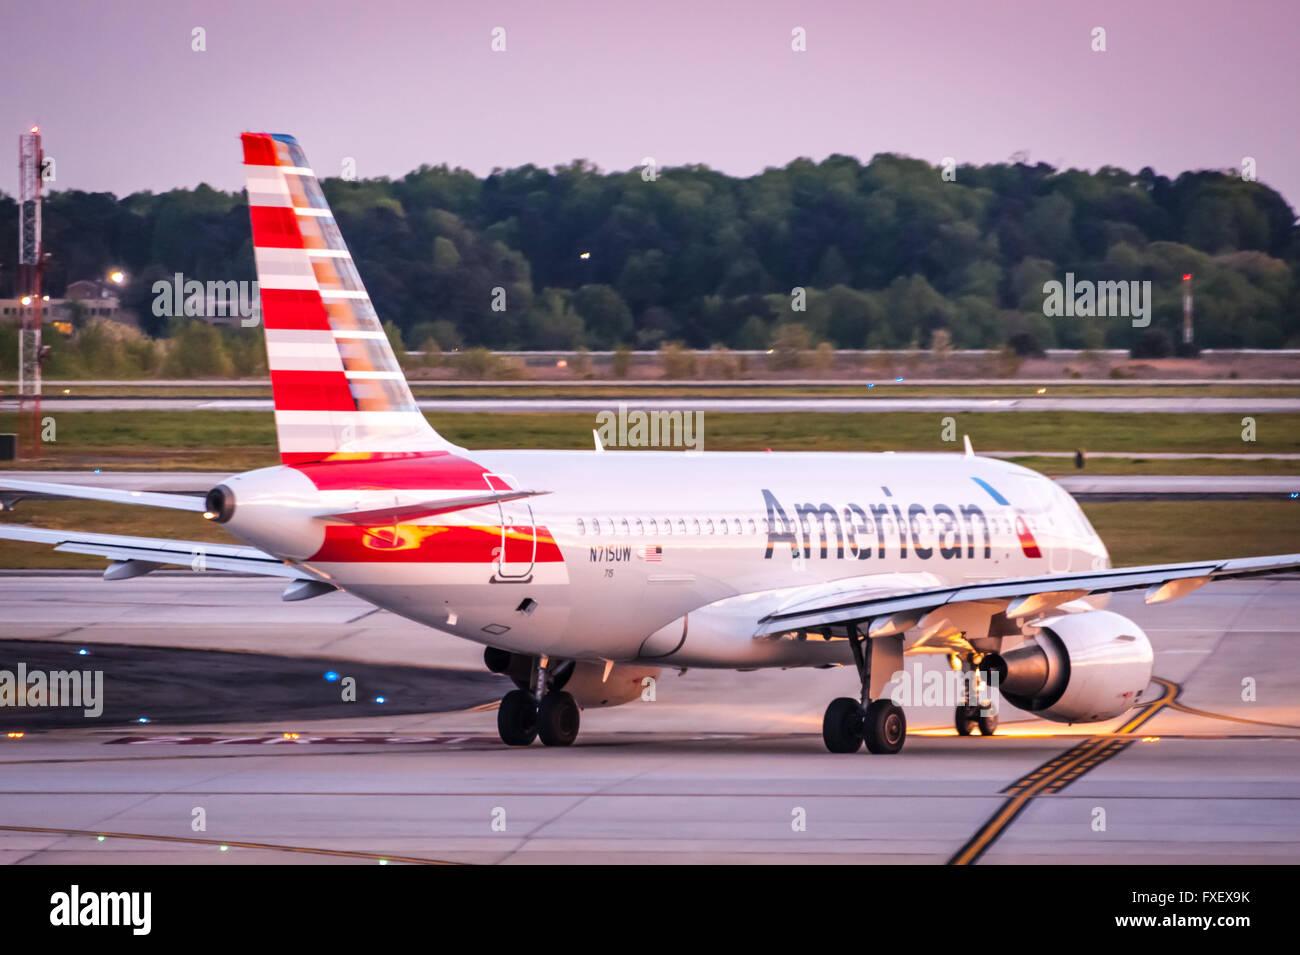 American Airlines passenger jet at Hartsfield-Jackson Atlanta International Airport in Atlanta, Georgia, USA. - Stock Image